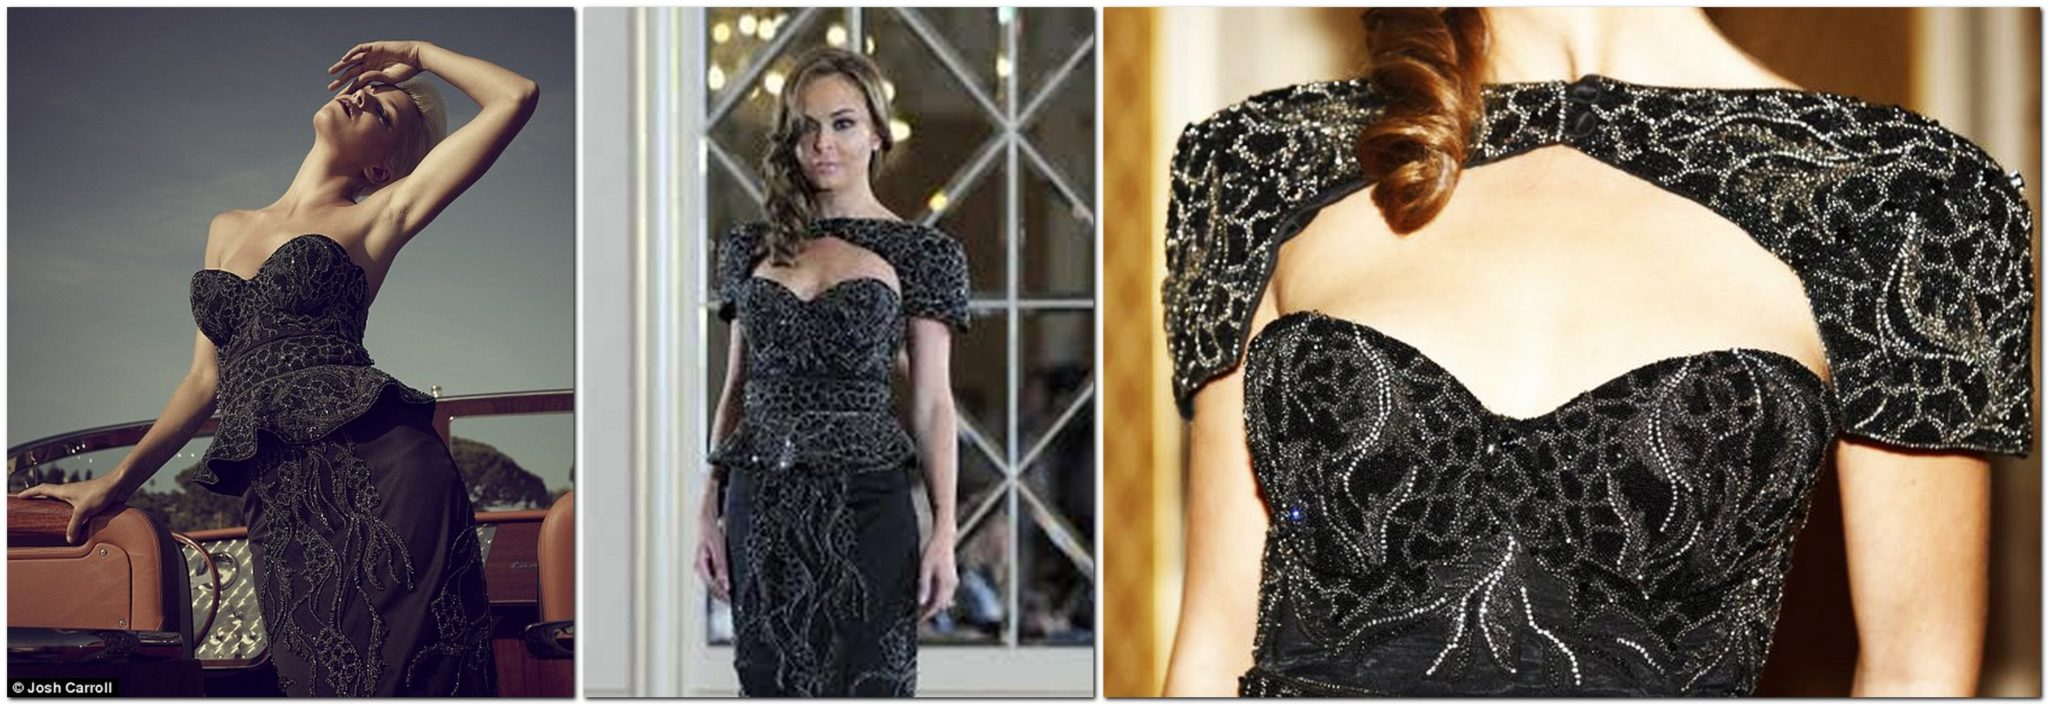 Black Diamond Dress by Debbie Wingham